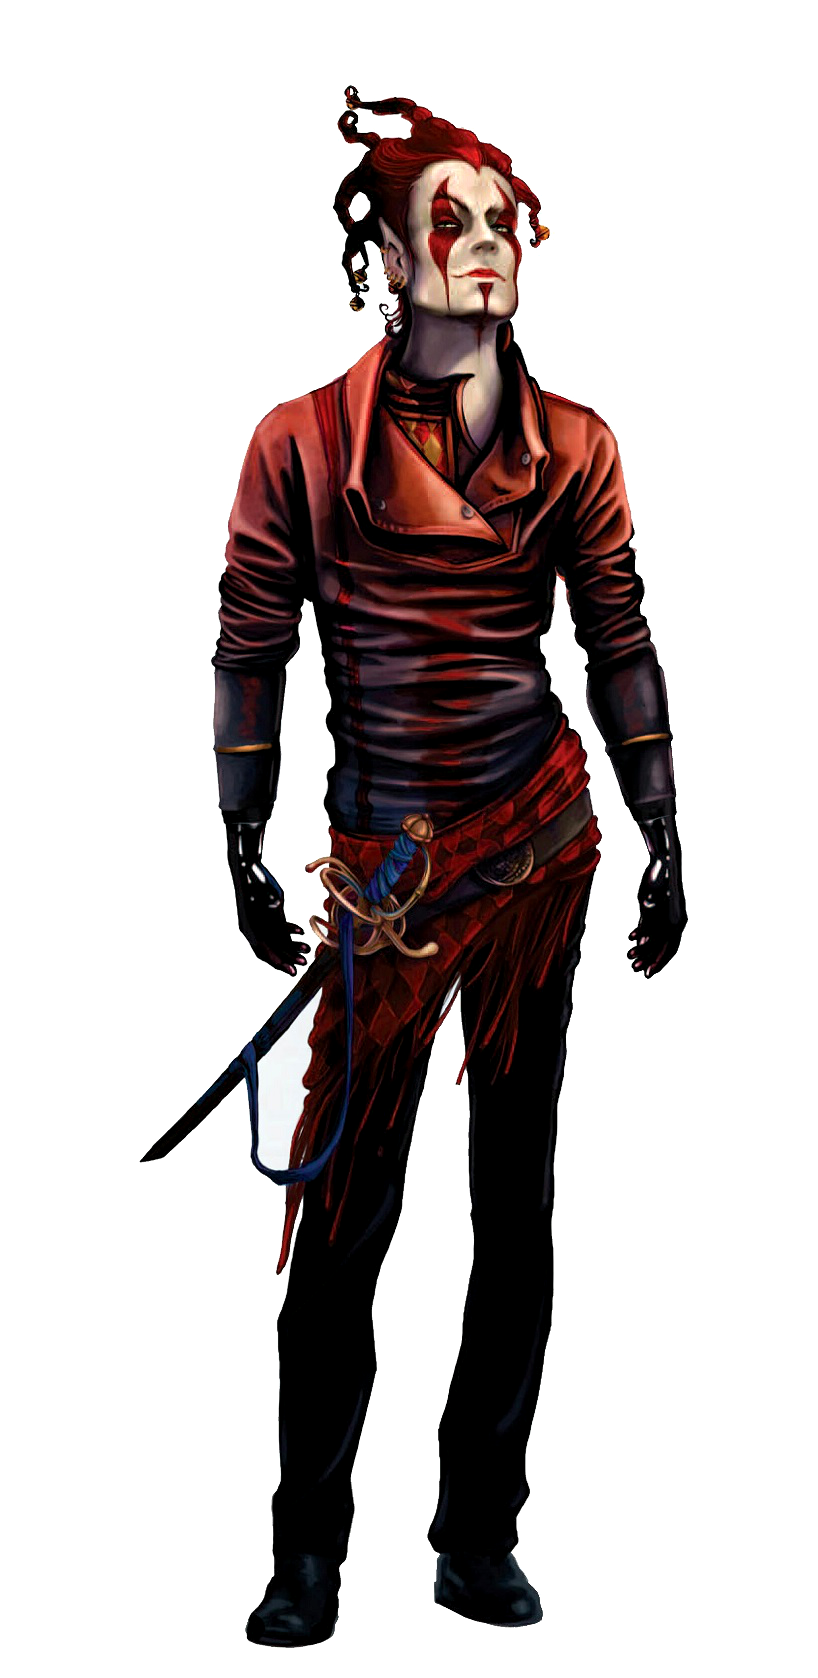 Half Elf Jester Bard Pathfinder Pfrpg Dnd Dd D20 Fantasy Elven